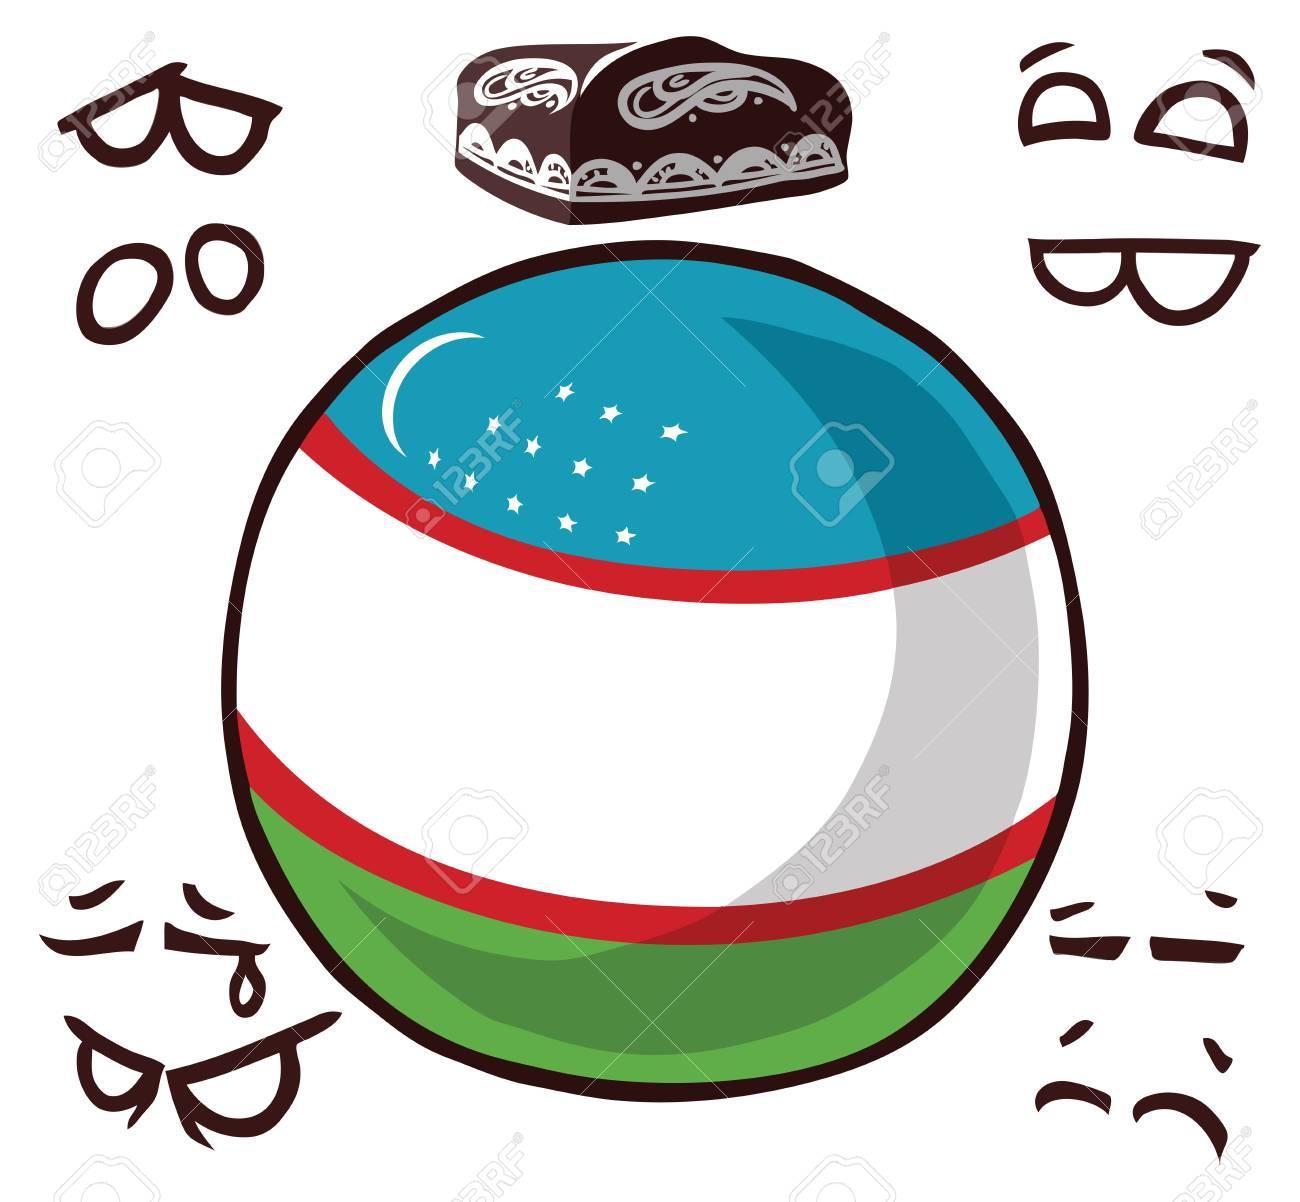 country ball uzbekistan - 114846428